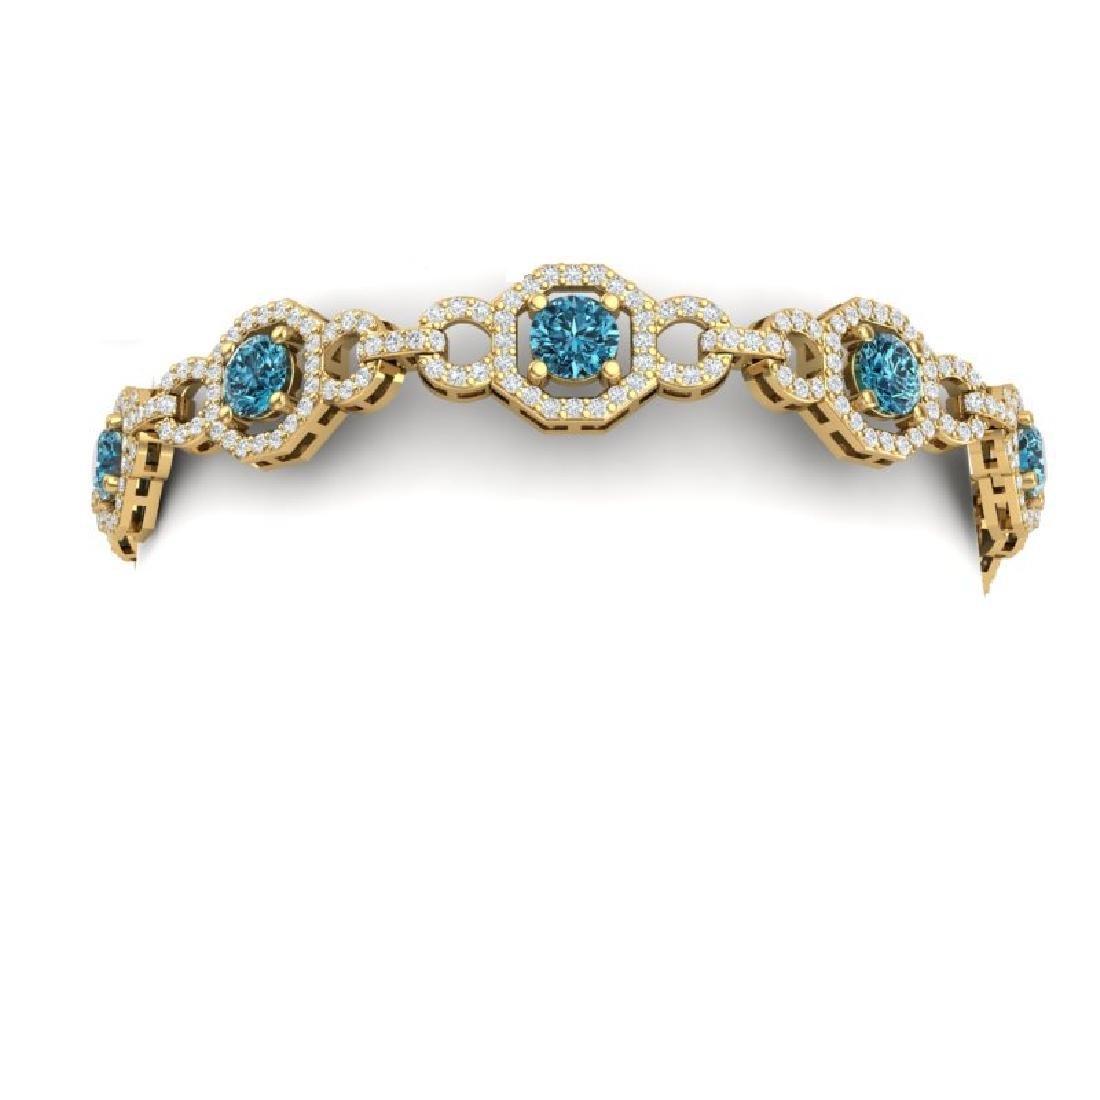 12 CTW SI/I Intense Blue And White Diamond Bracelet 18K - 2